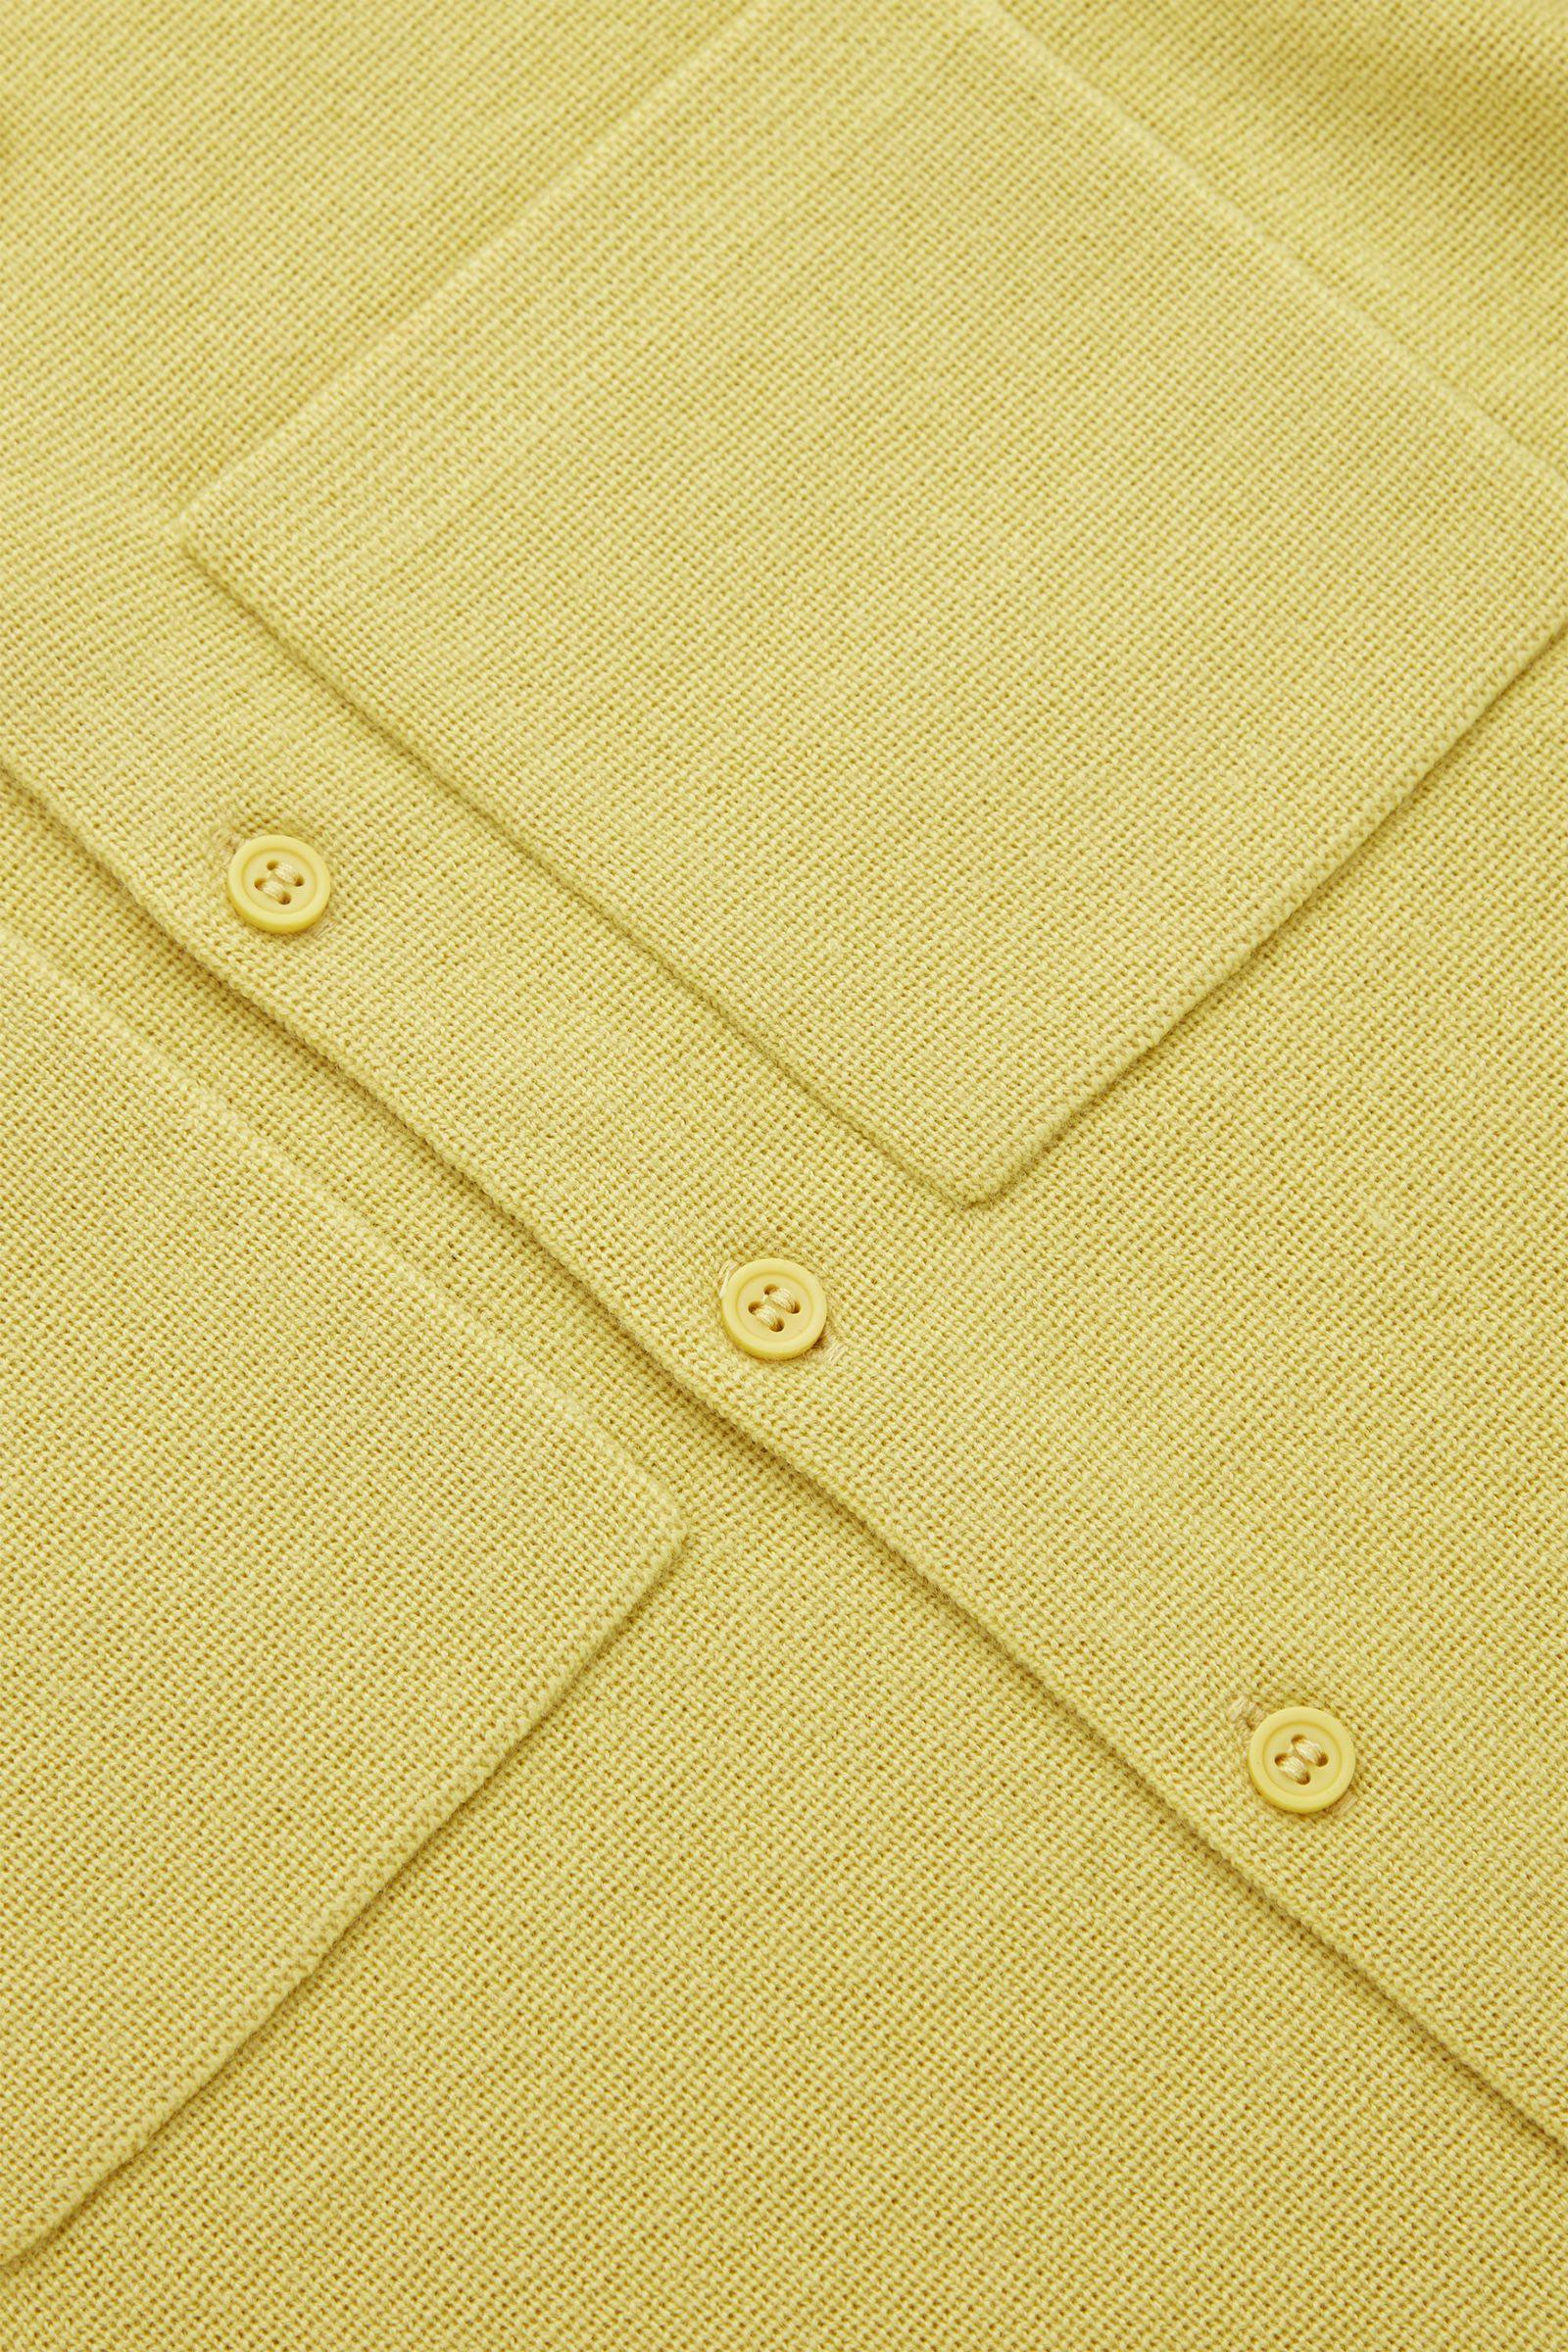 COS 니티드 울 재킷의 옐로우컬러 Detail입니다.